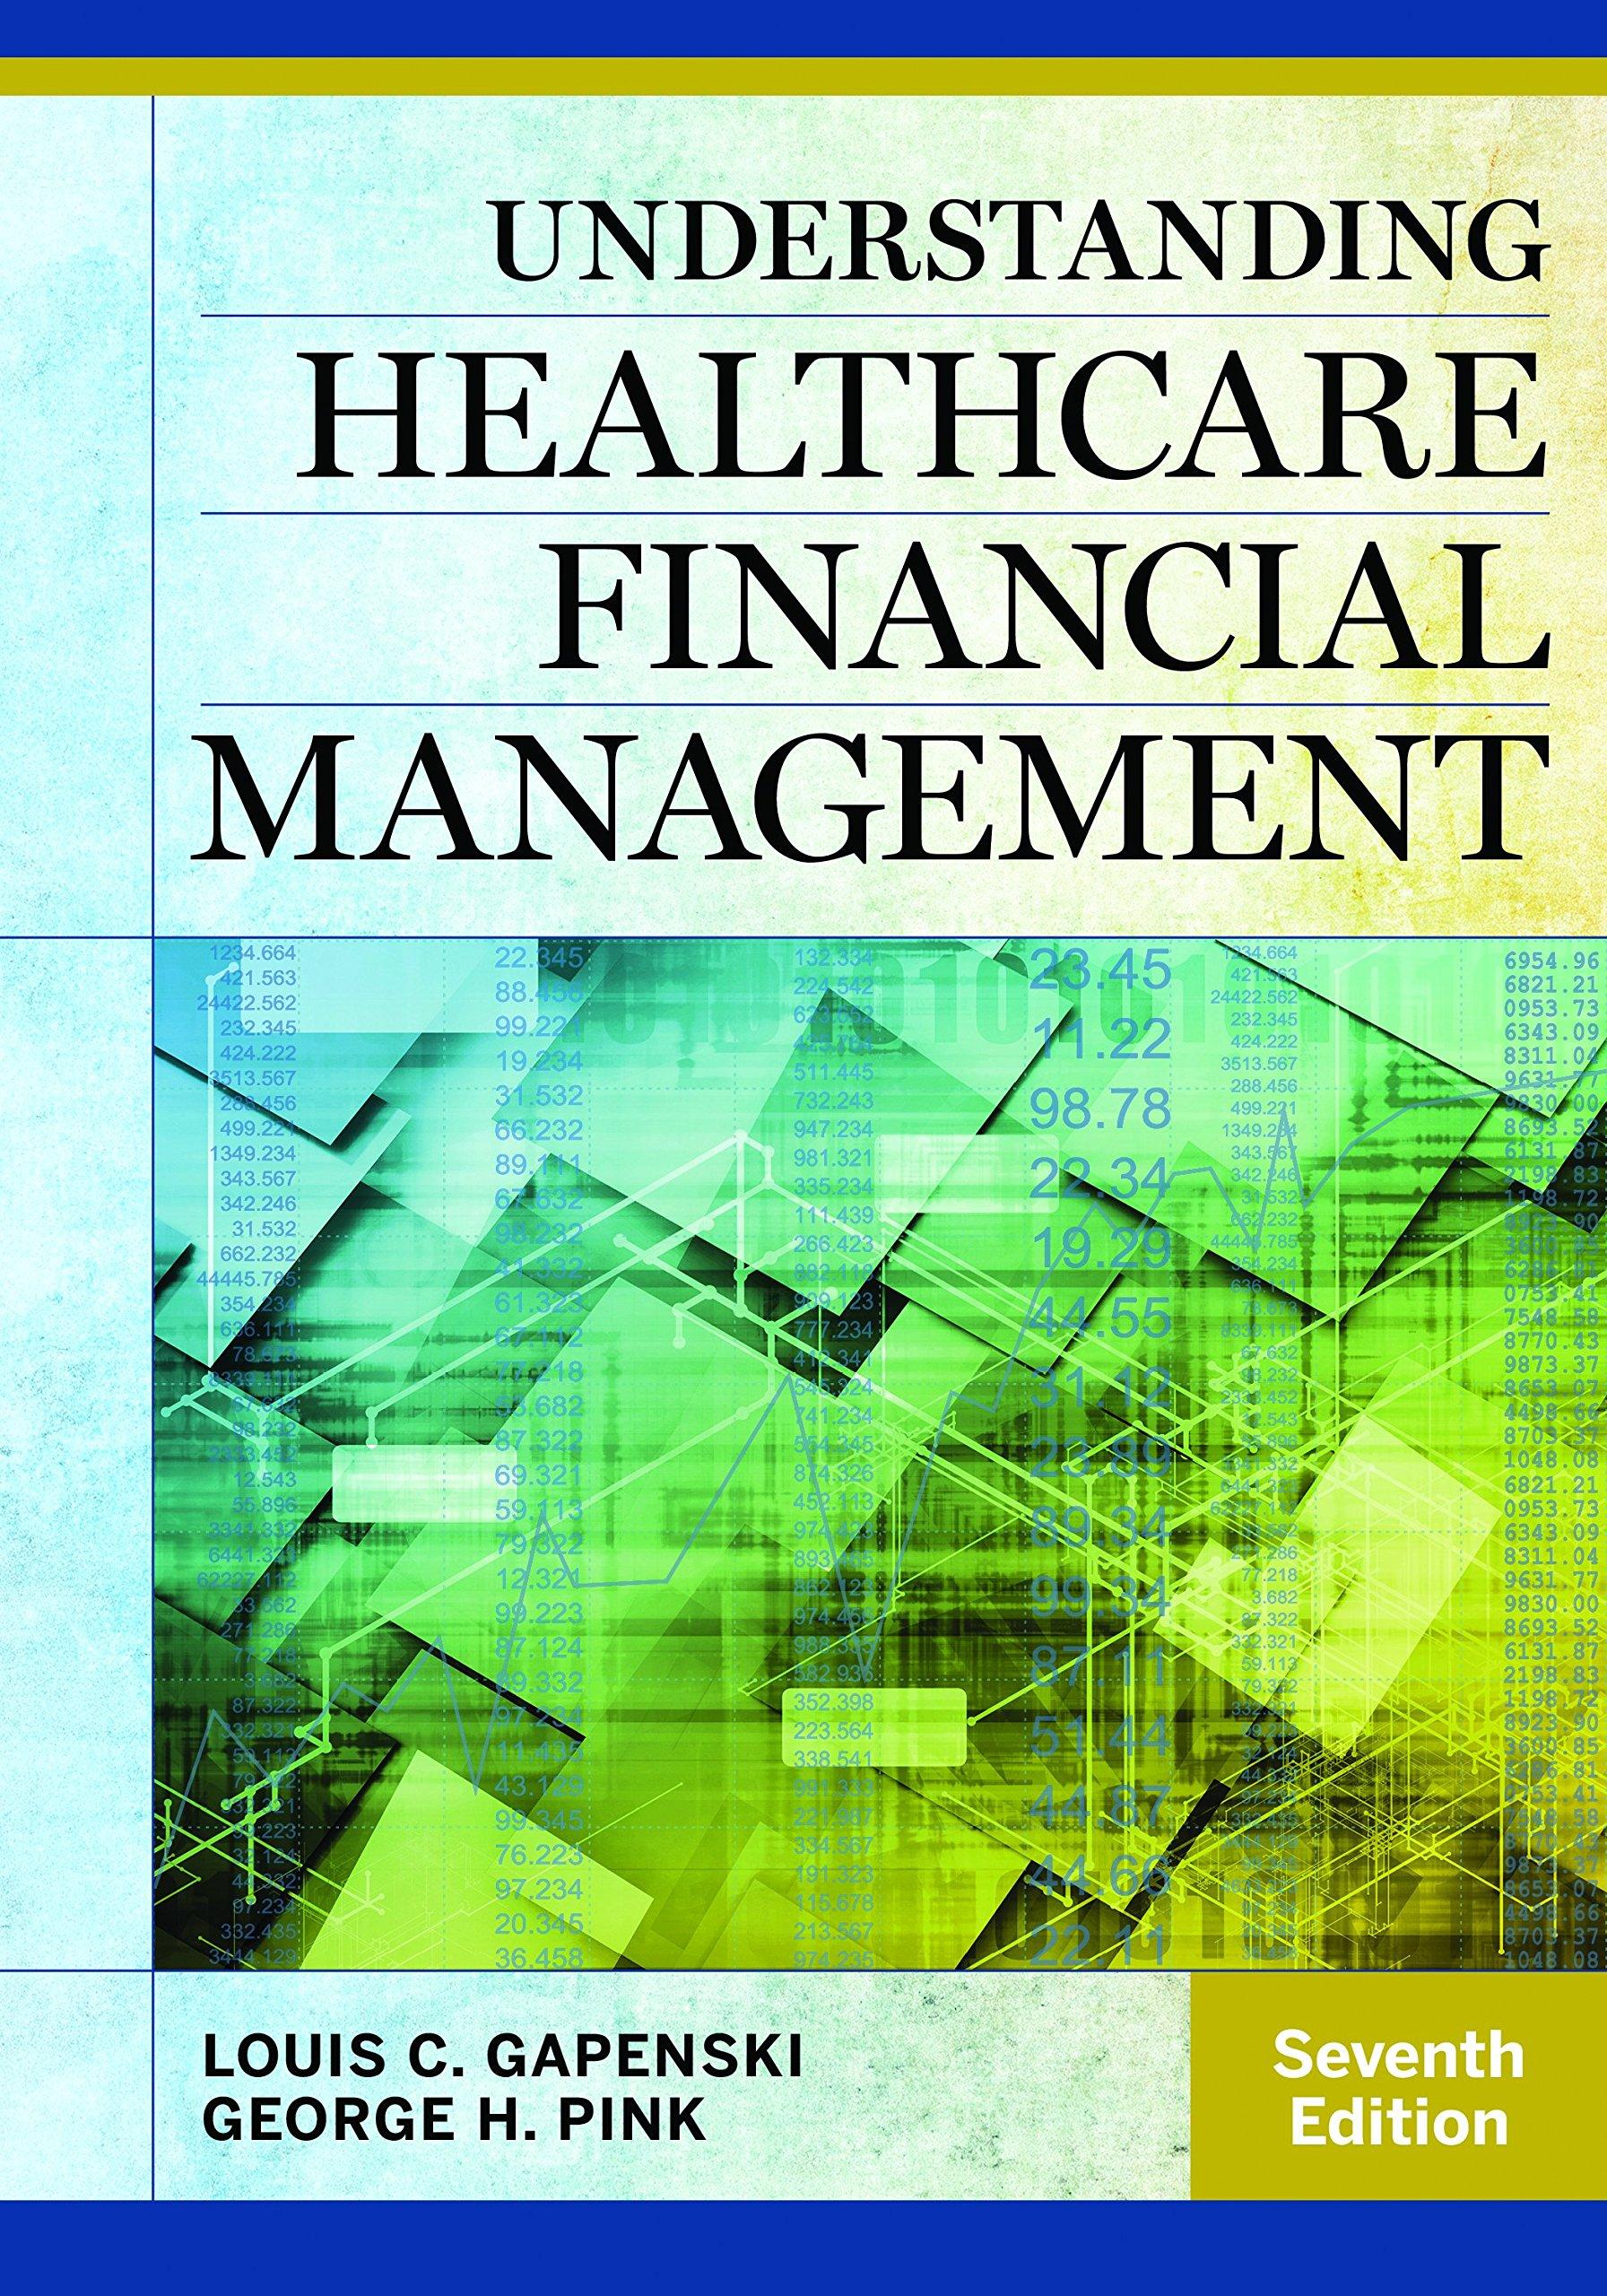 Understanding Healthcare Financial Management, Seventh Edition